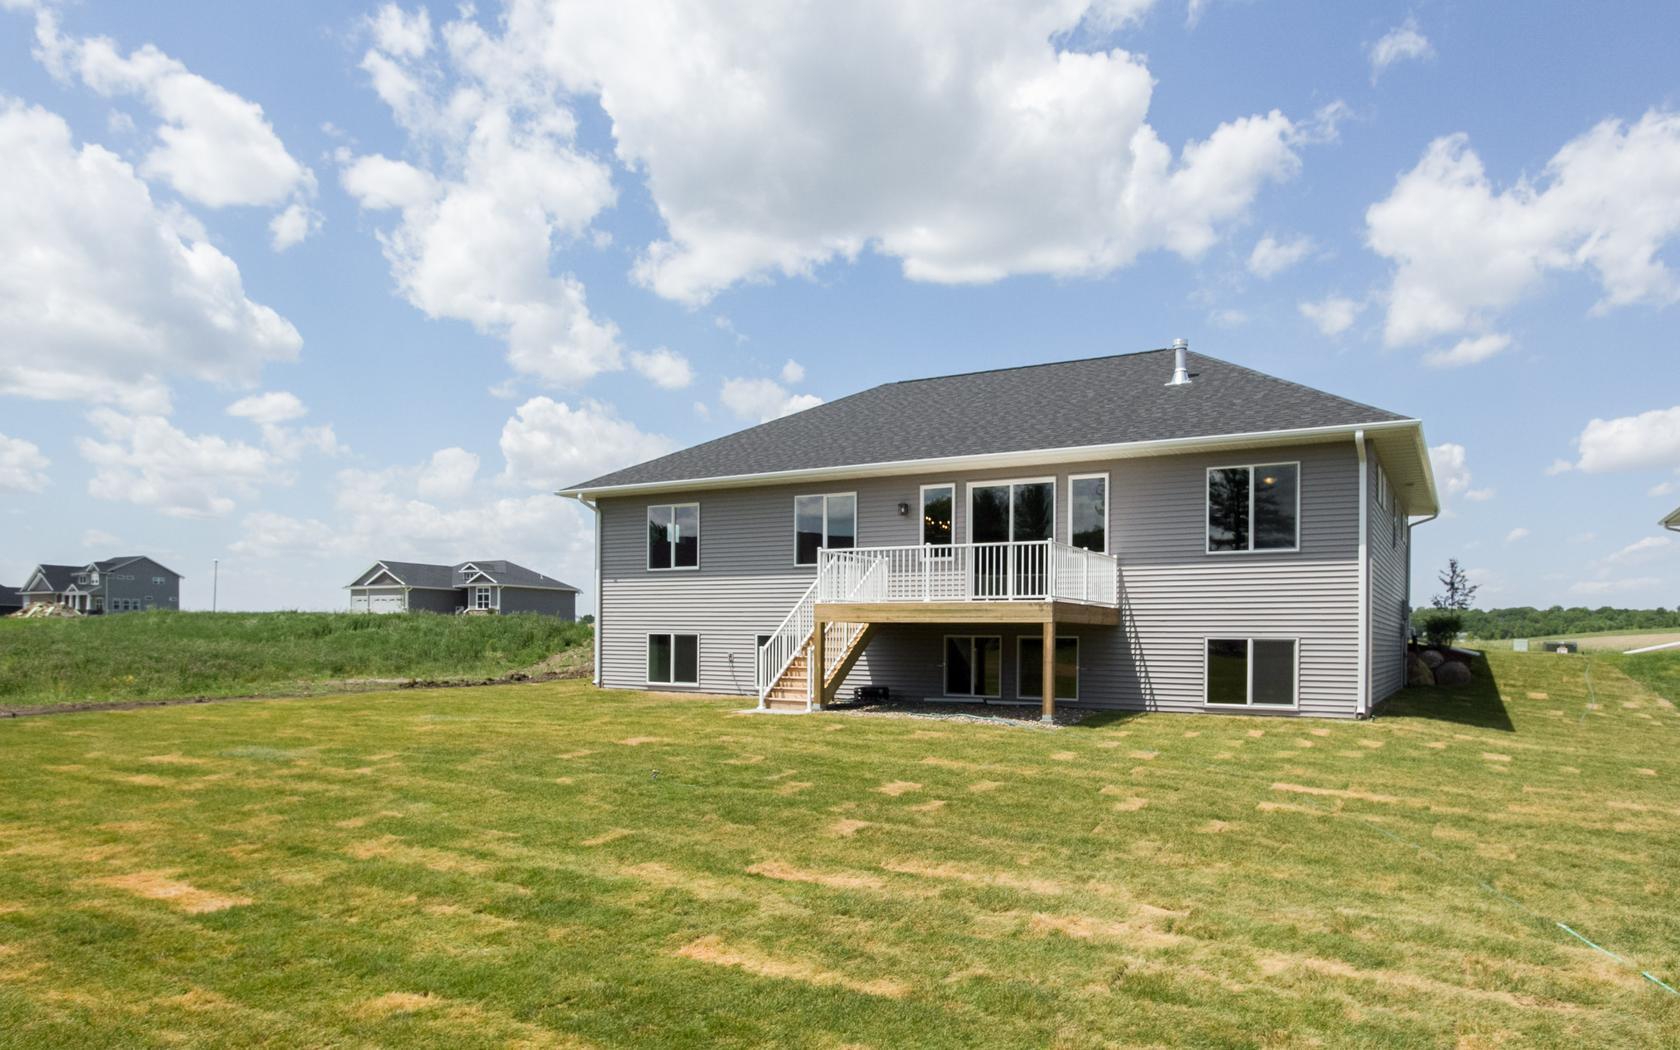 H&H Home Builders Exterior Design Image #36